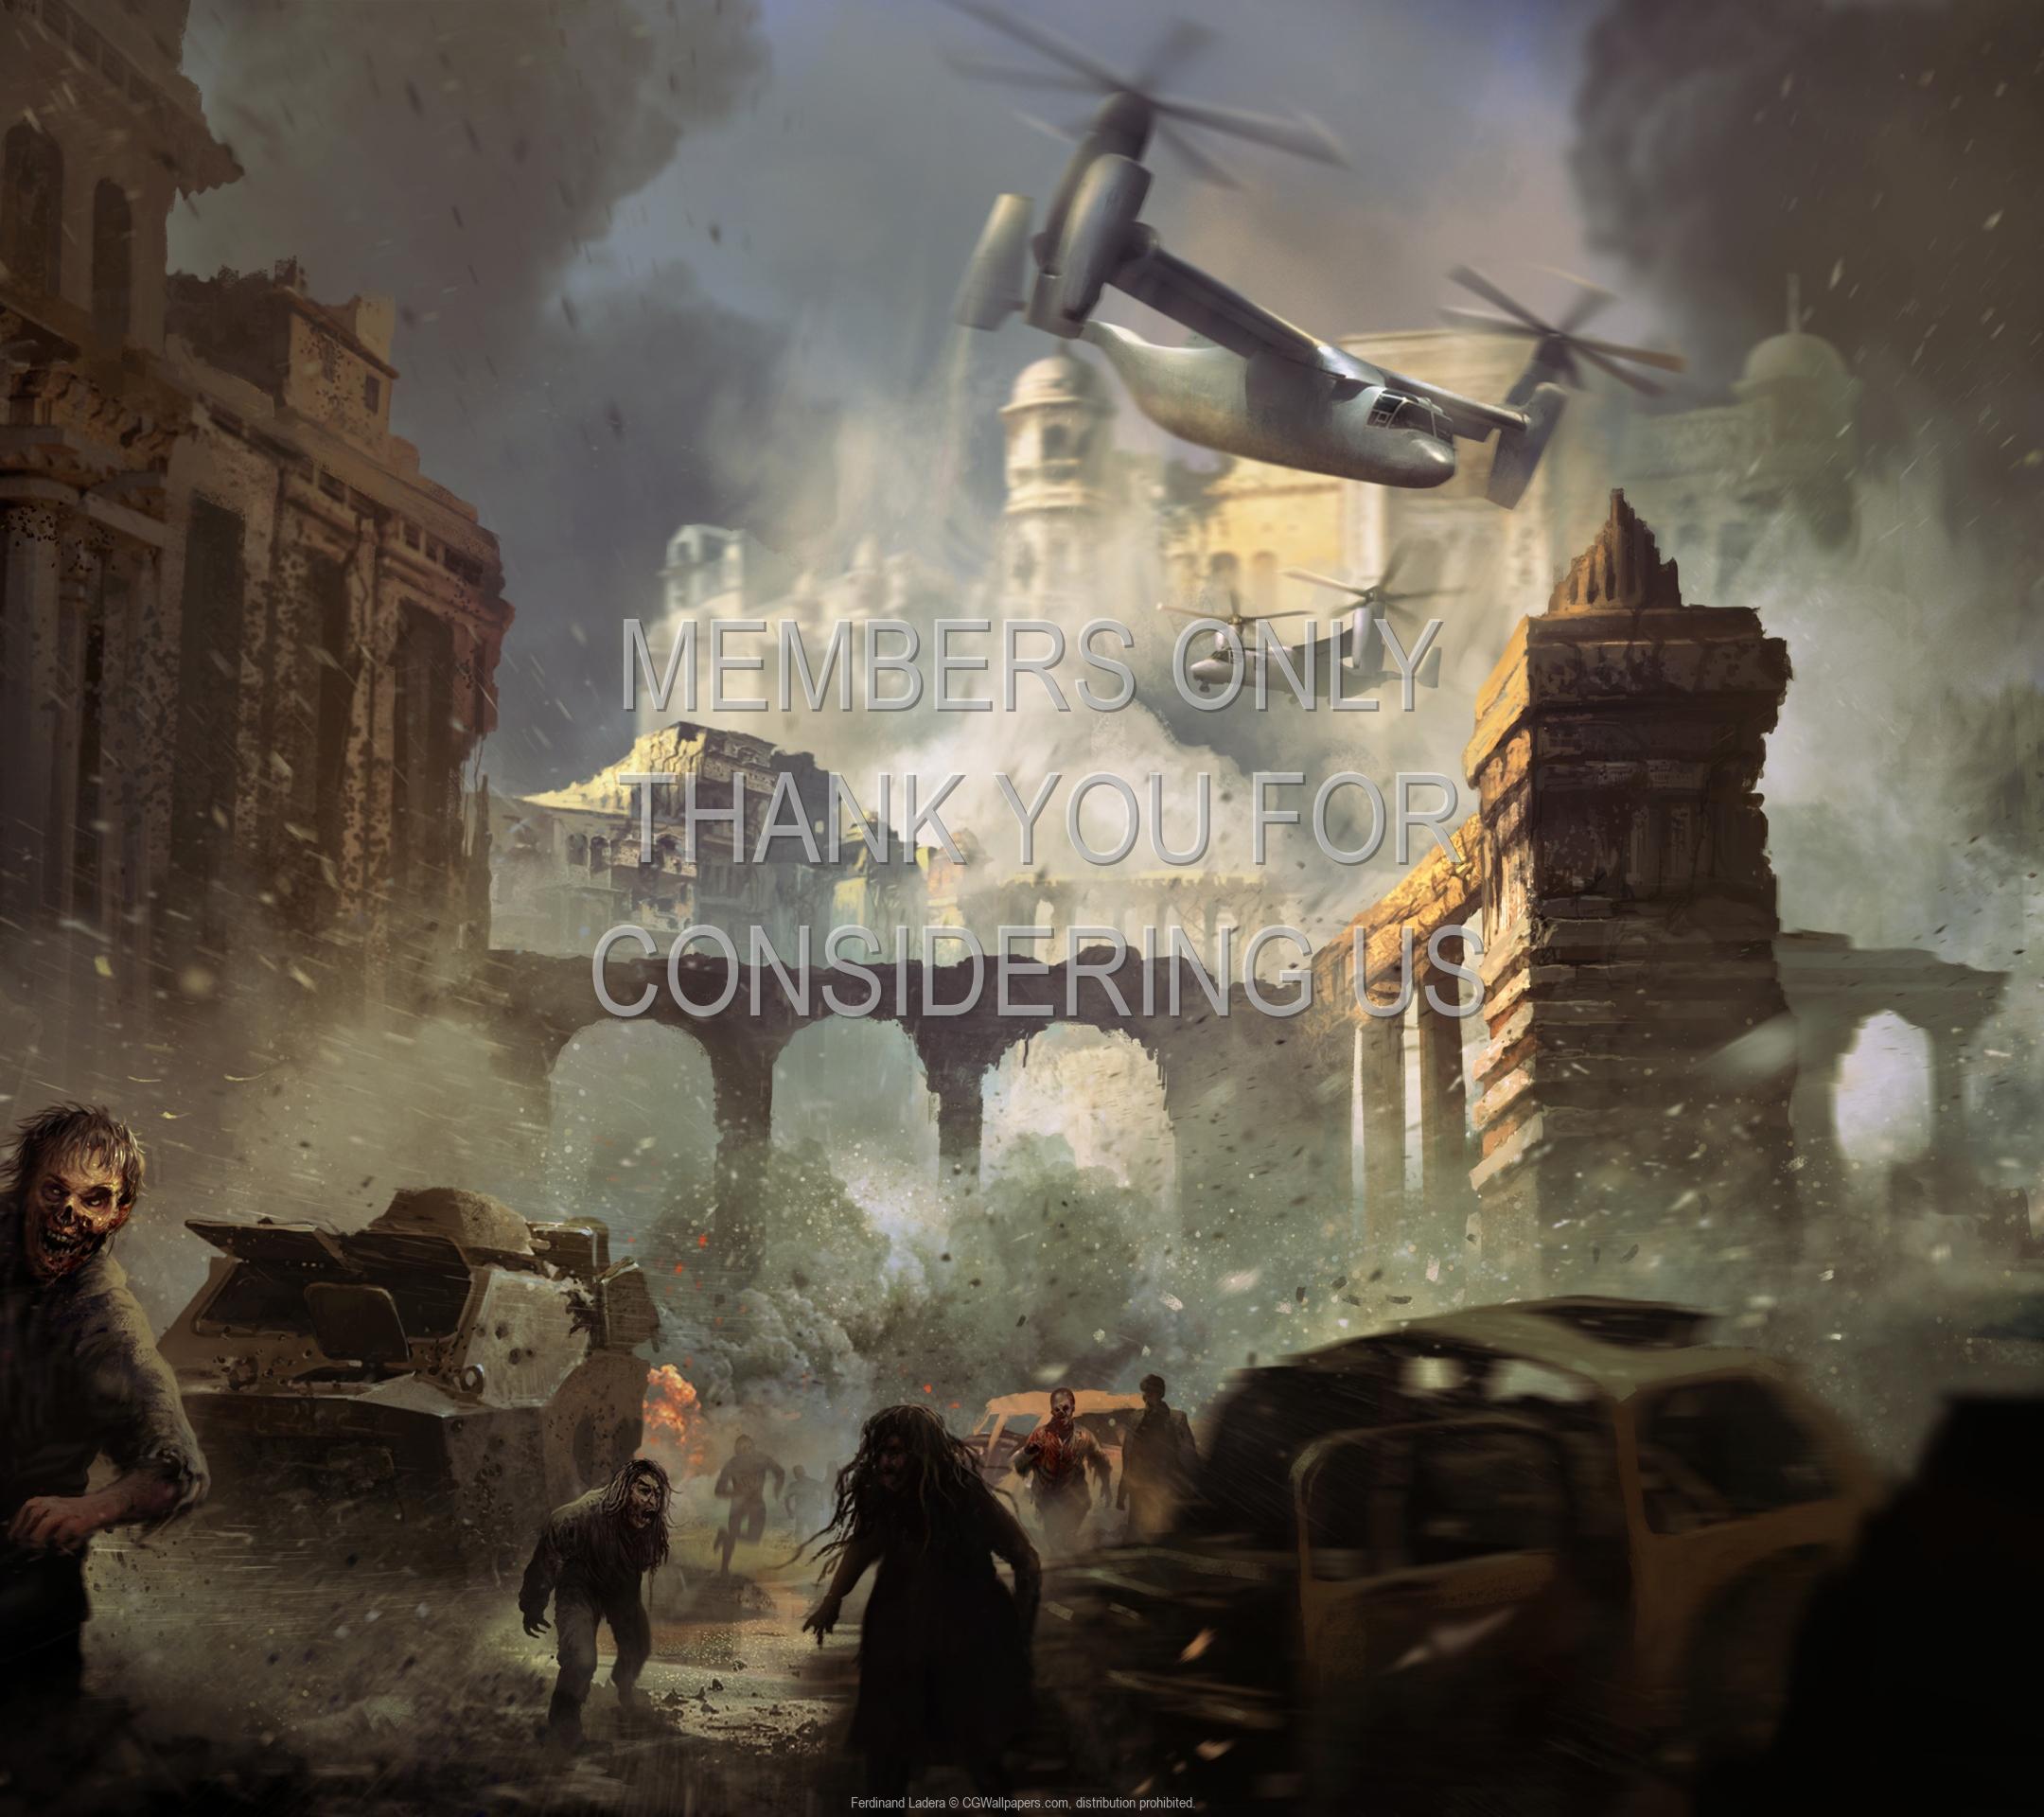 Ferdinand Ladera 1080p Horizontal Mobile wallpaper or background 02